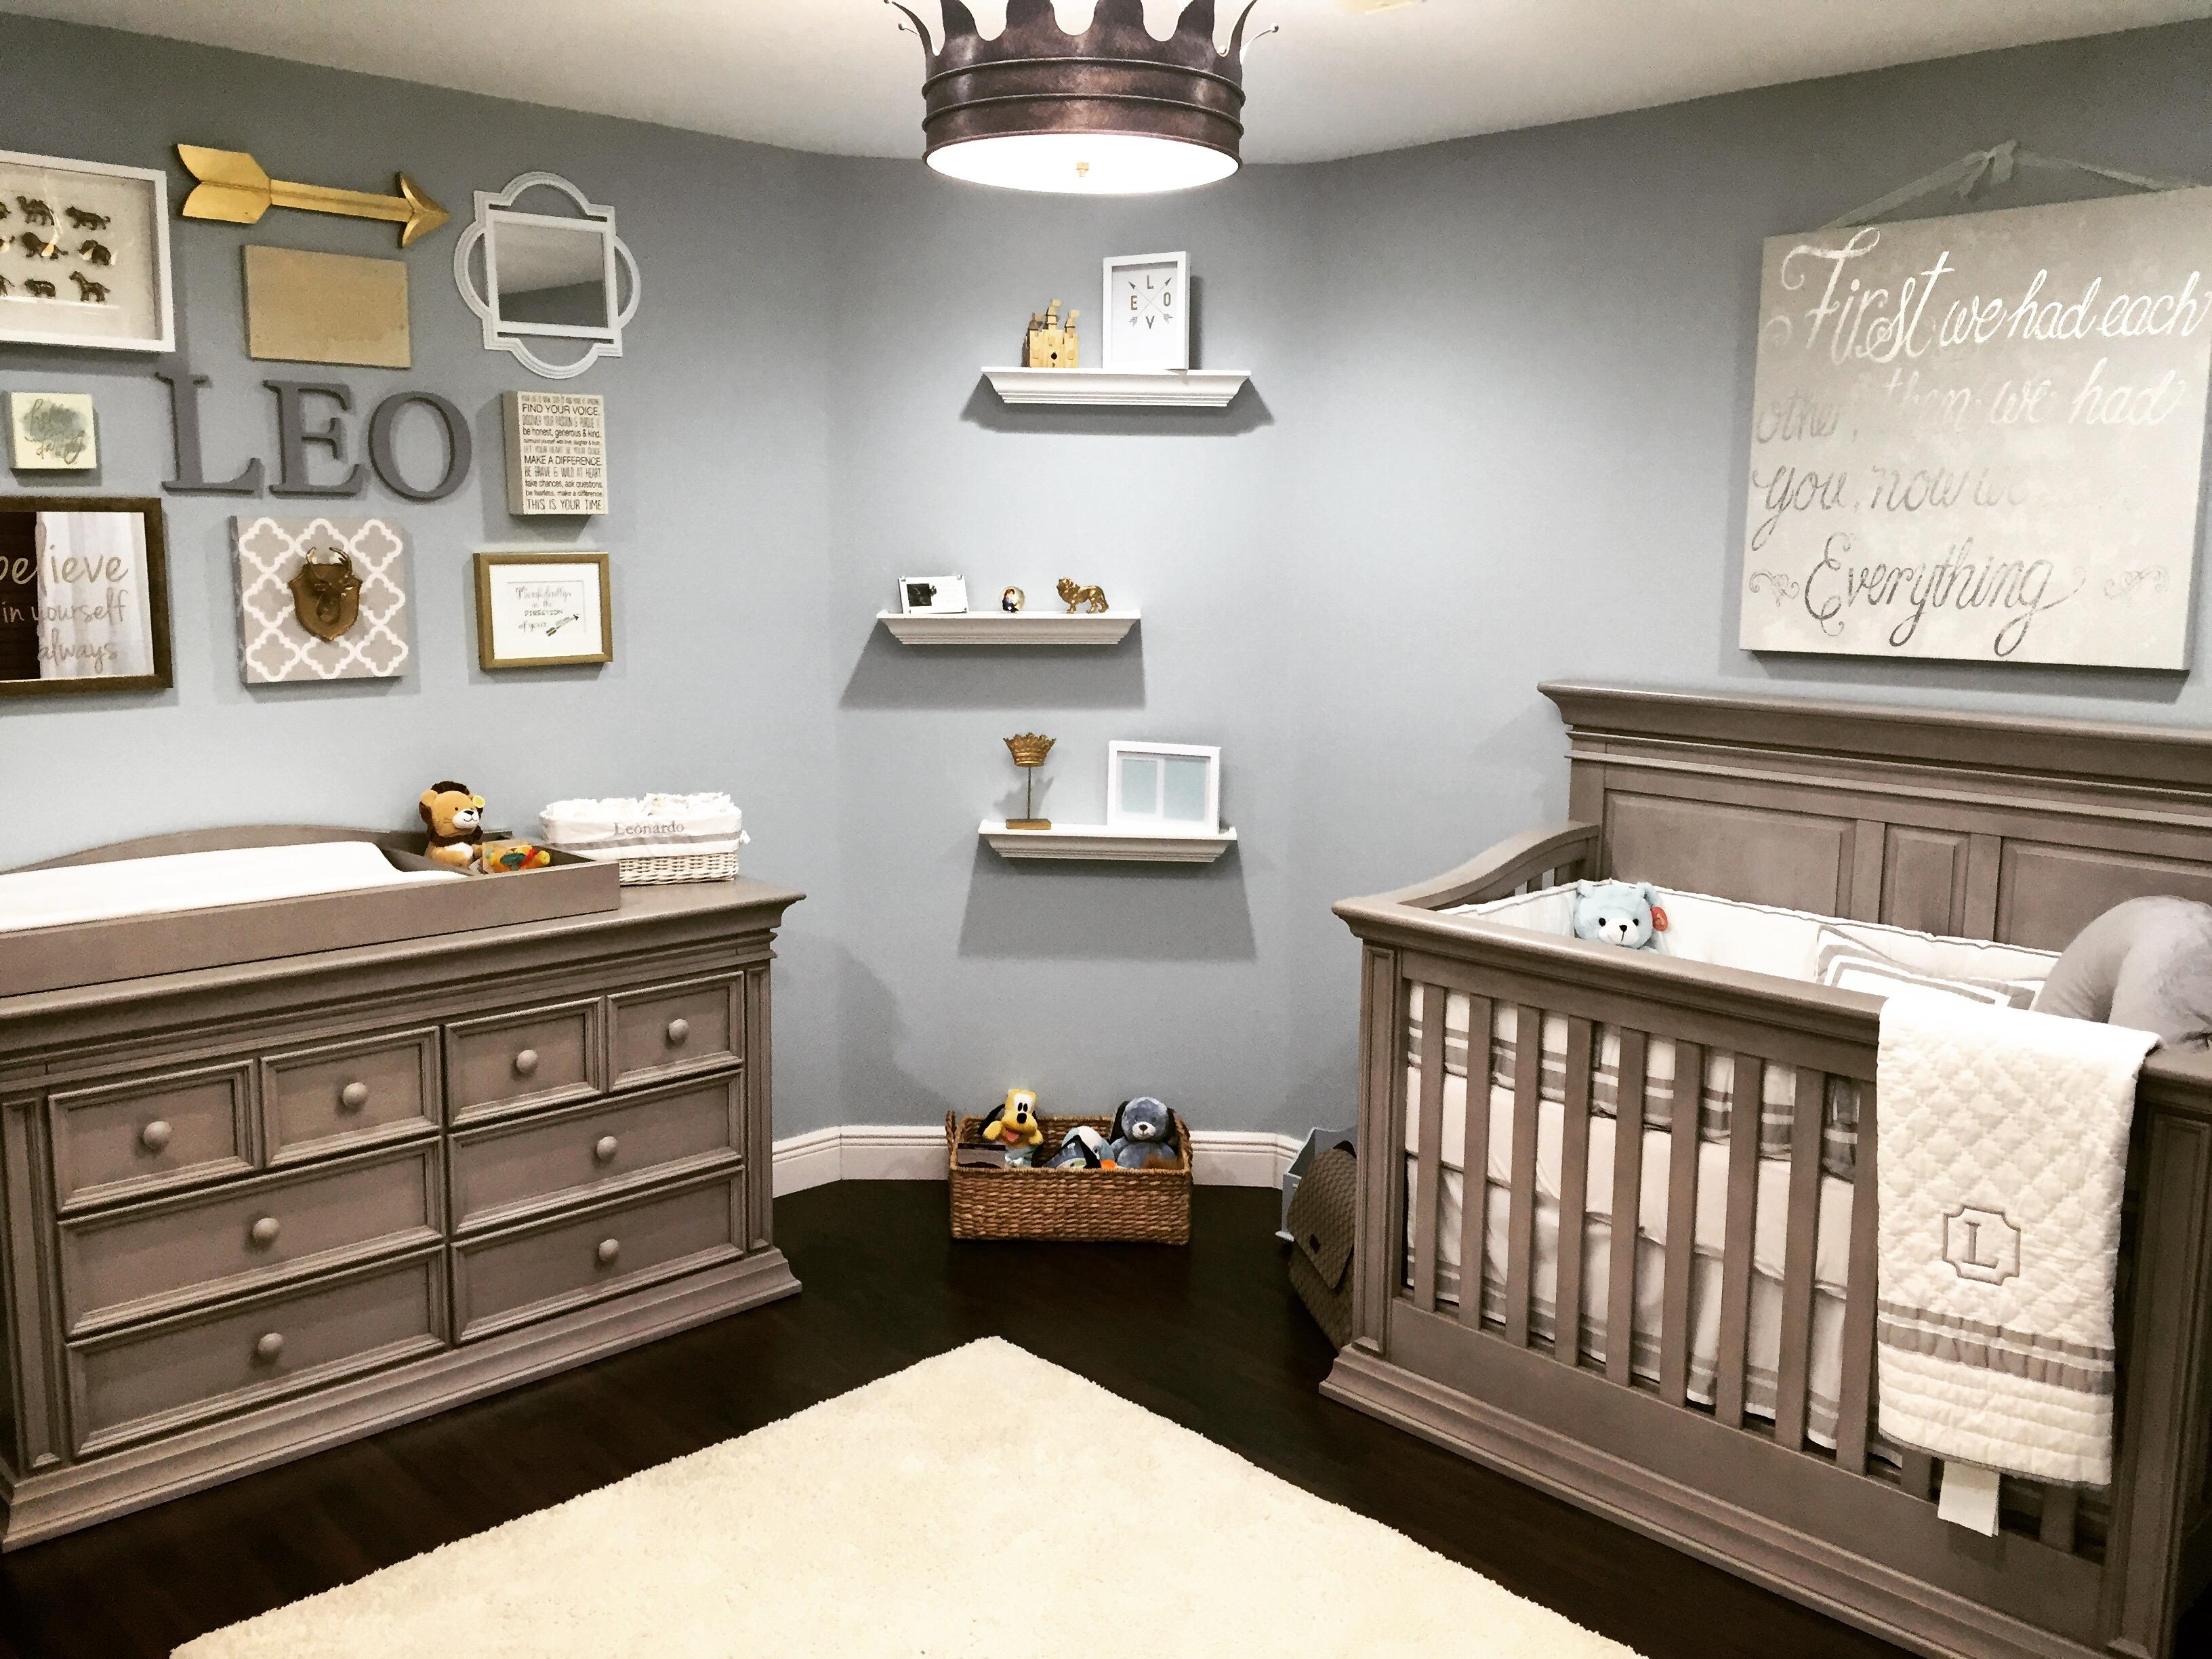 Little Leos Nursery fit for a King  Project Nursery